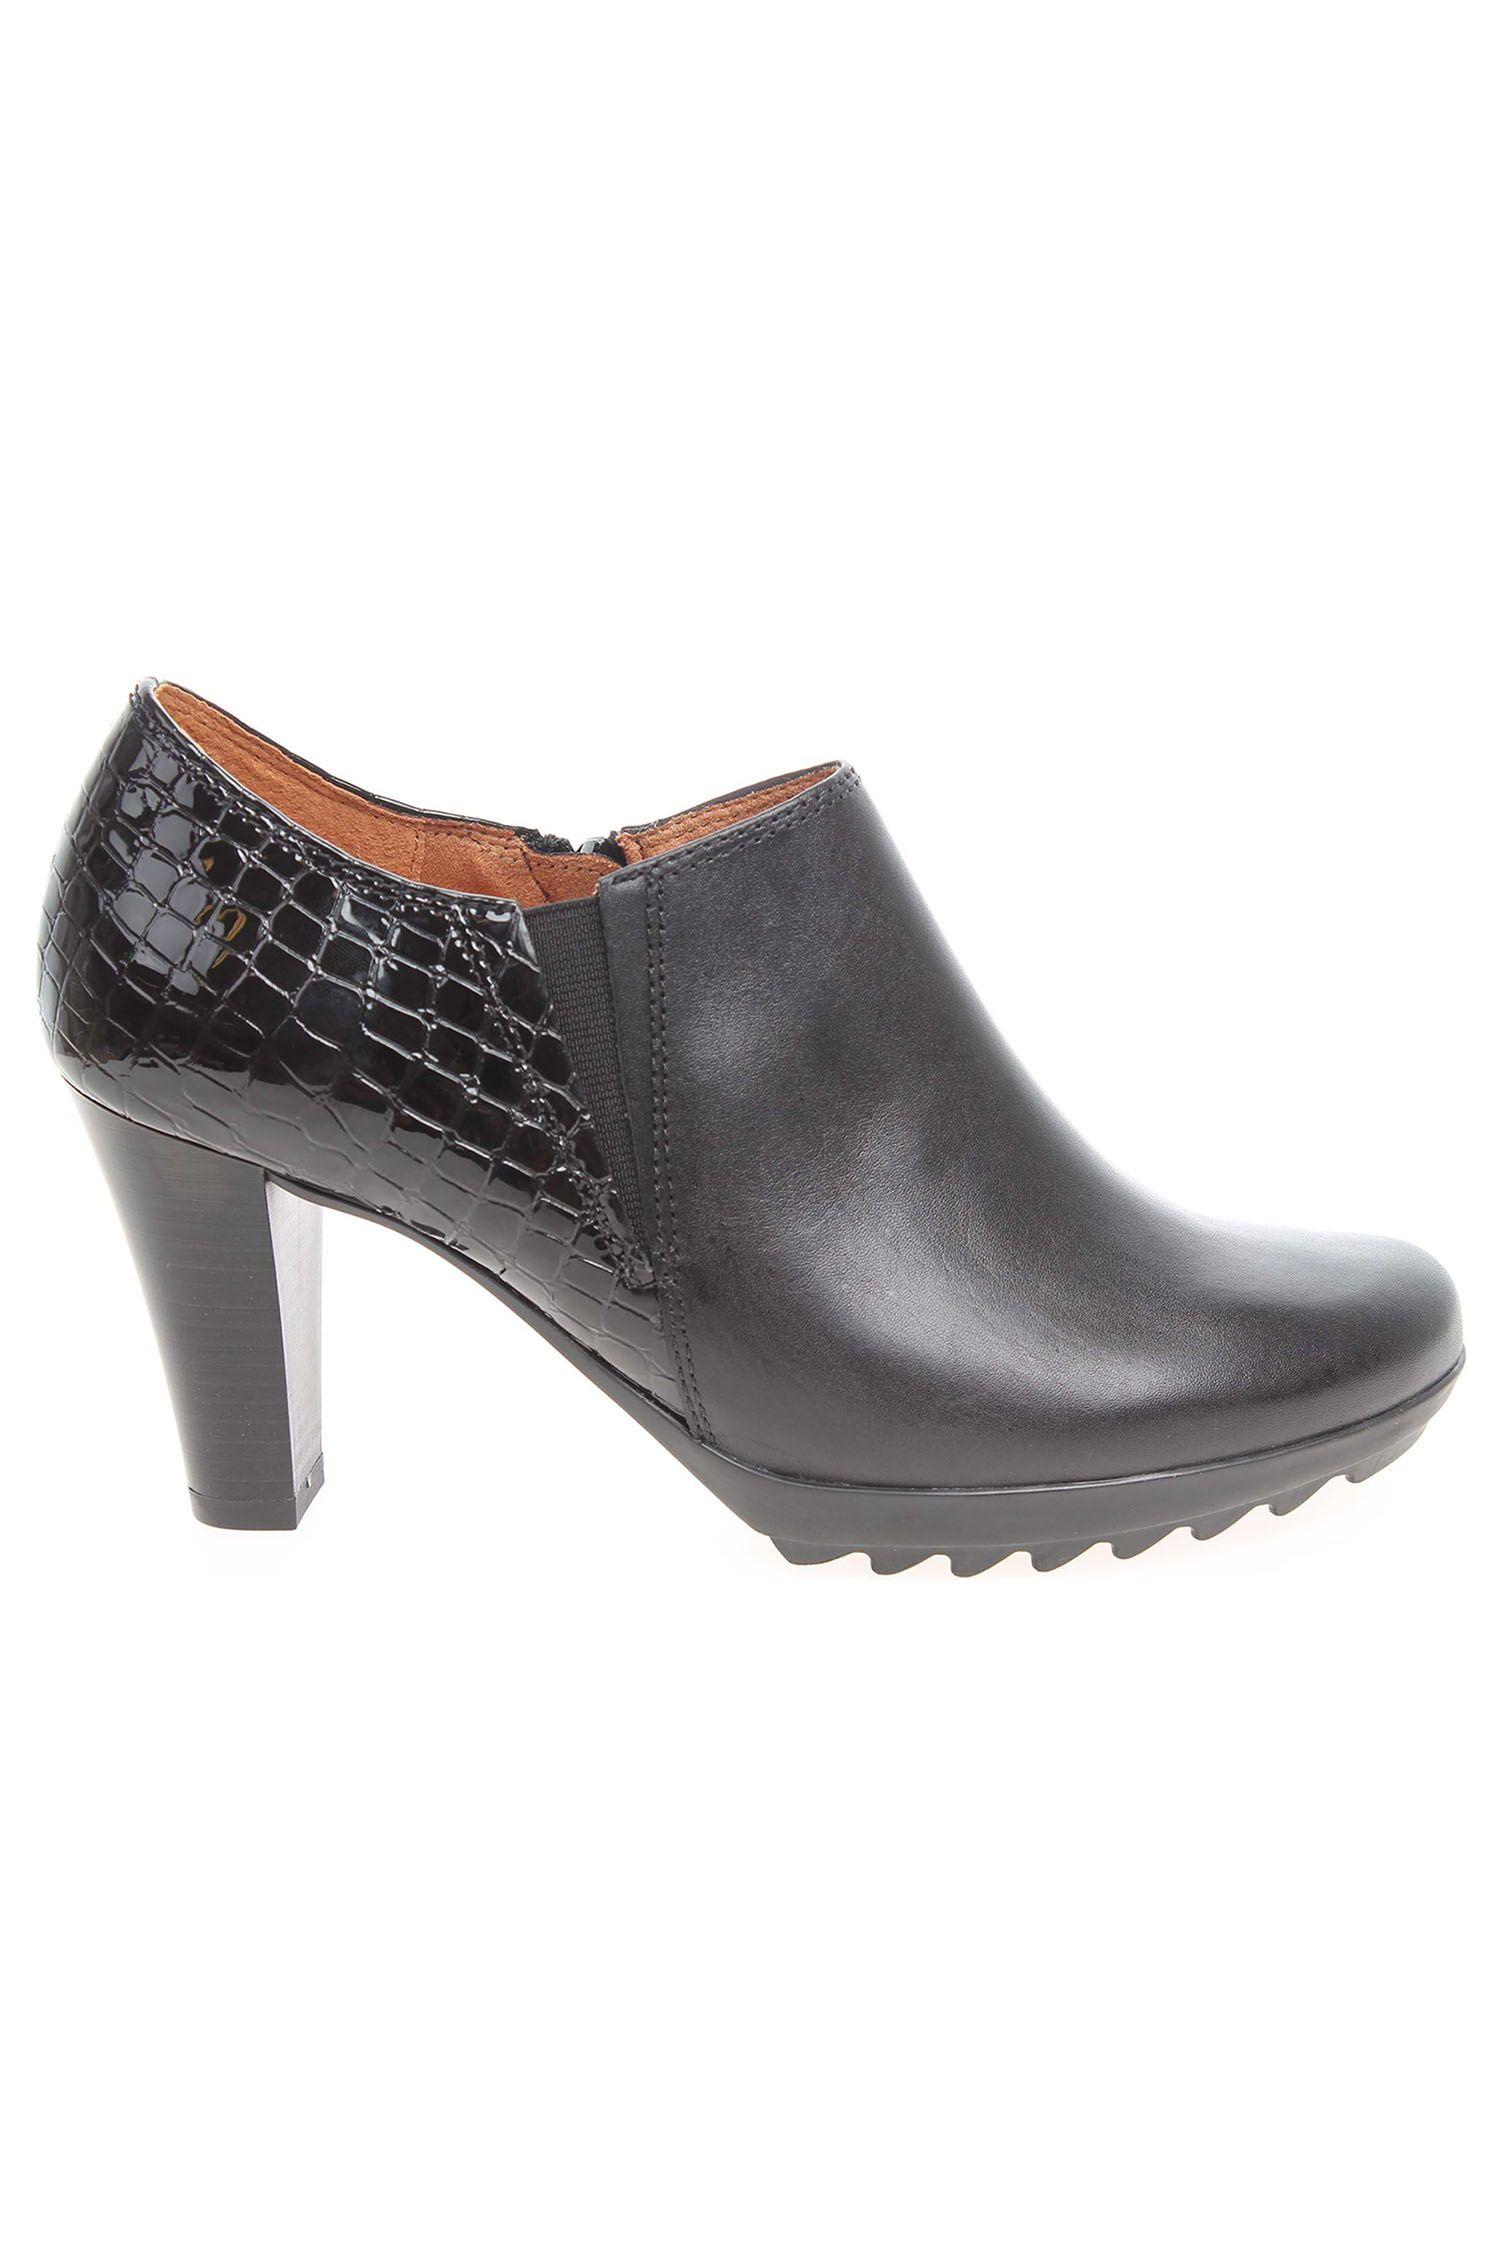 496a99307cefc Caprice dámské vycházkové 9-24701-27 černé | REJNOK obuv | Style